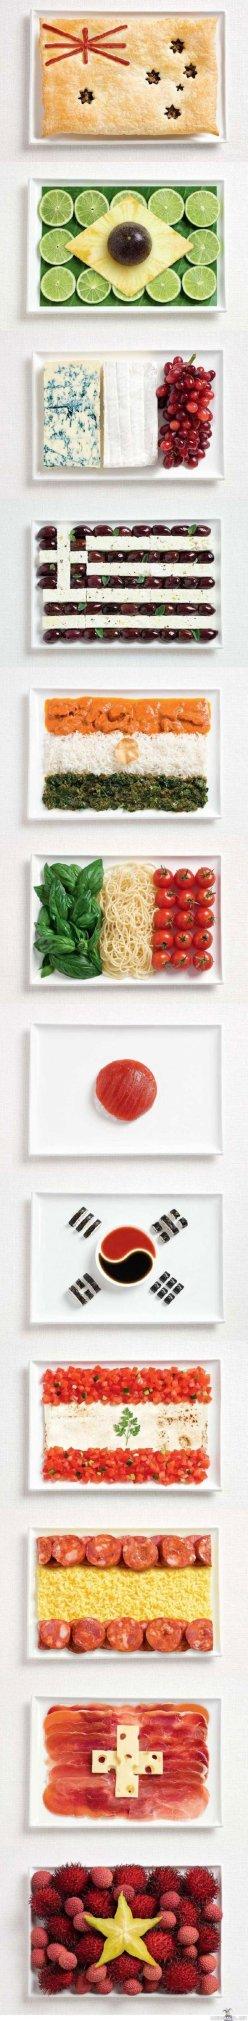 food flags plates chicquero